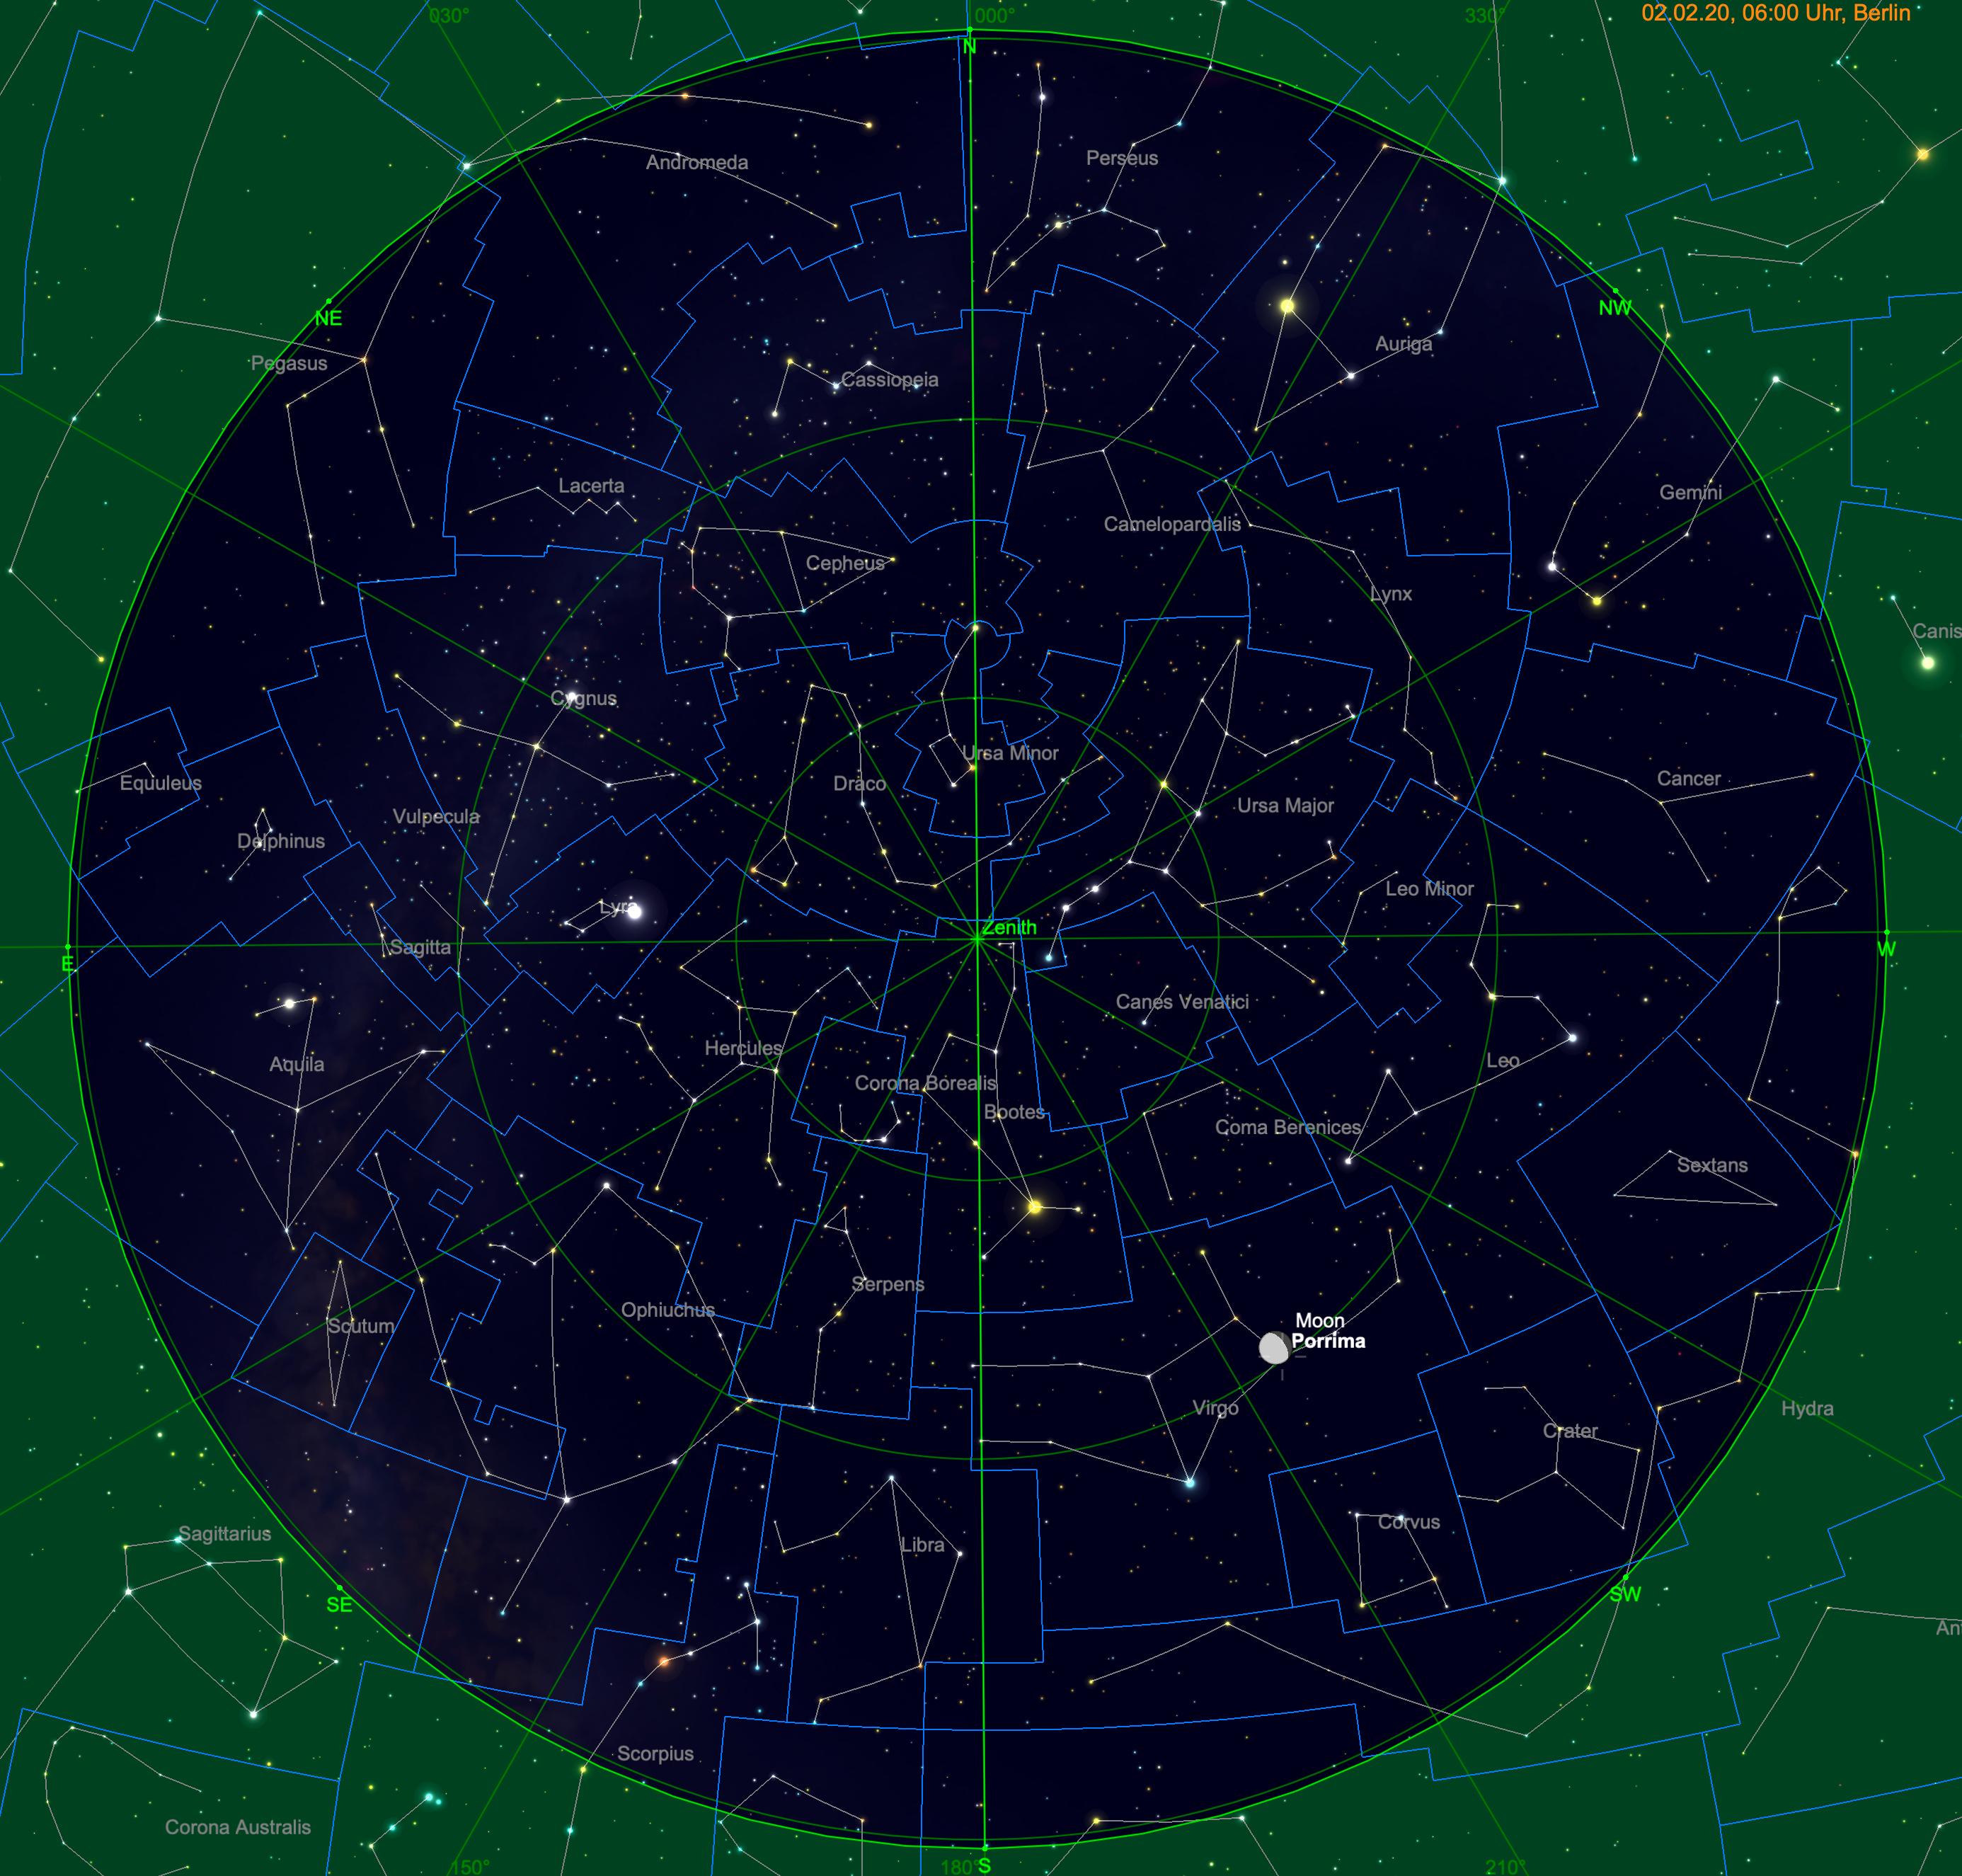 Mond nahe Porrima